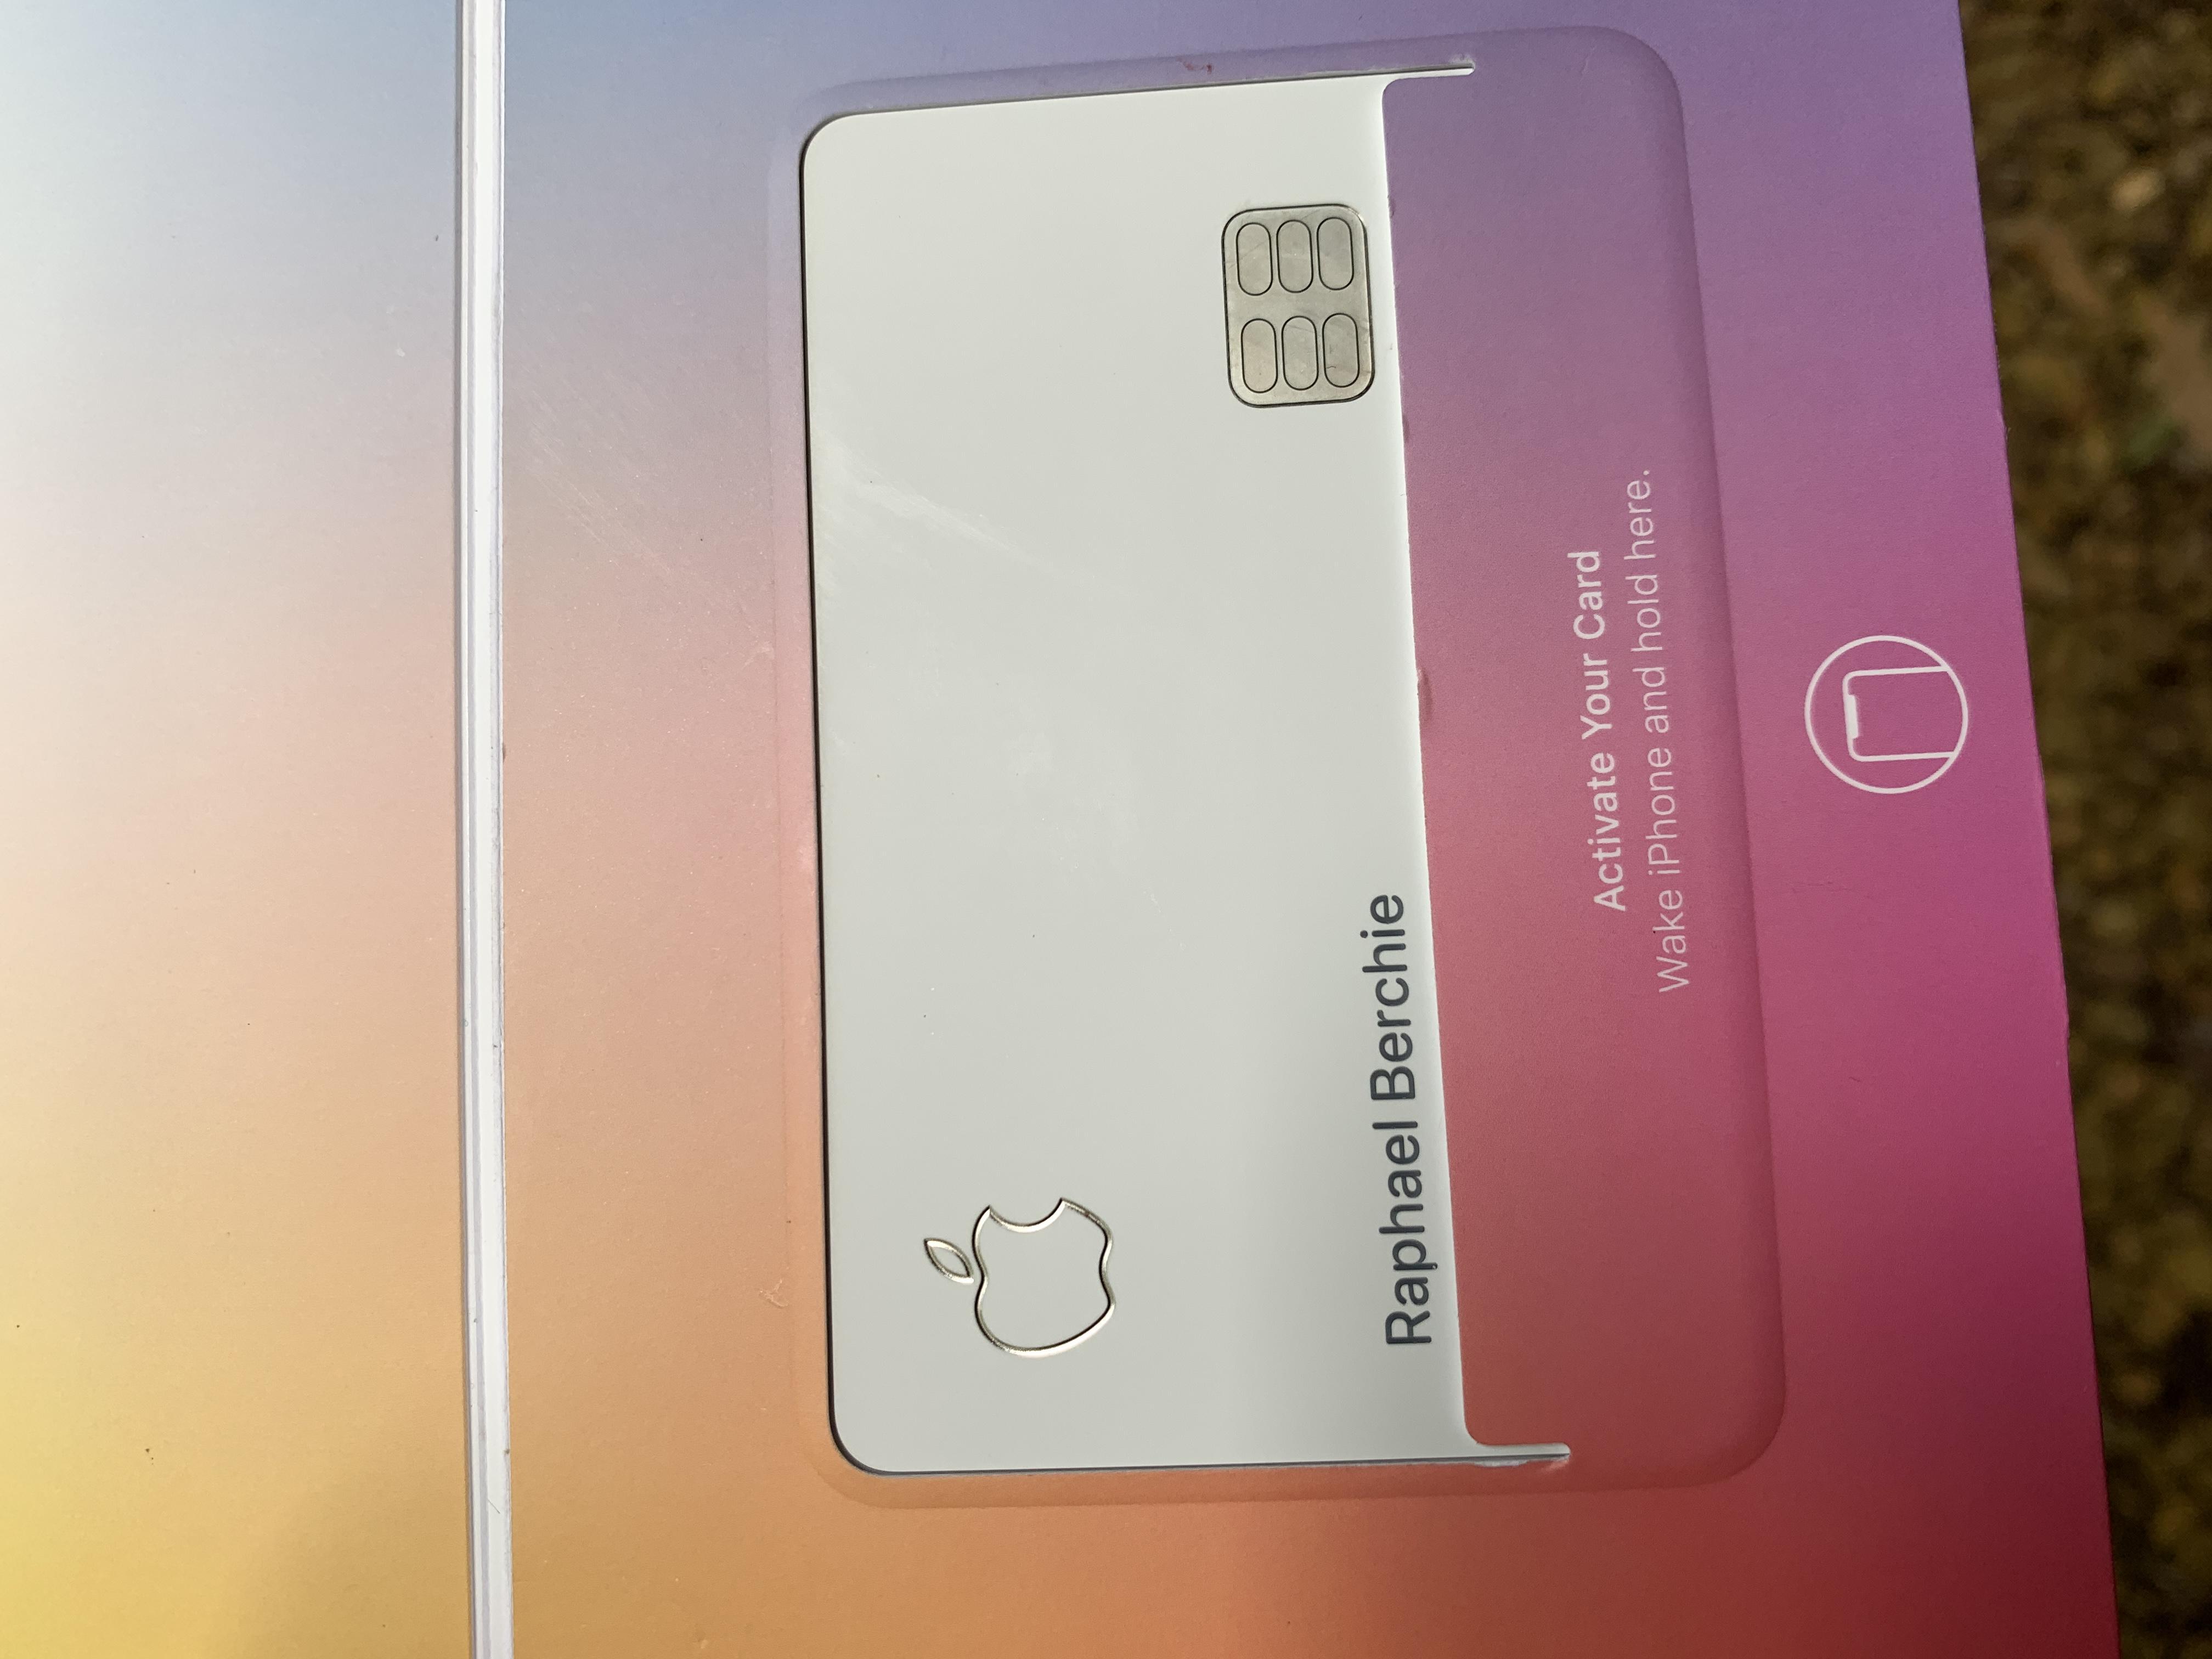 File:Apple credit card14 08 05 426000.jpeg - Wikimedia Commons